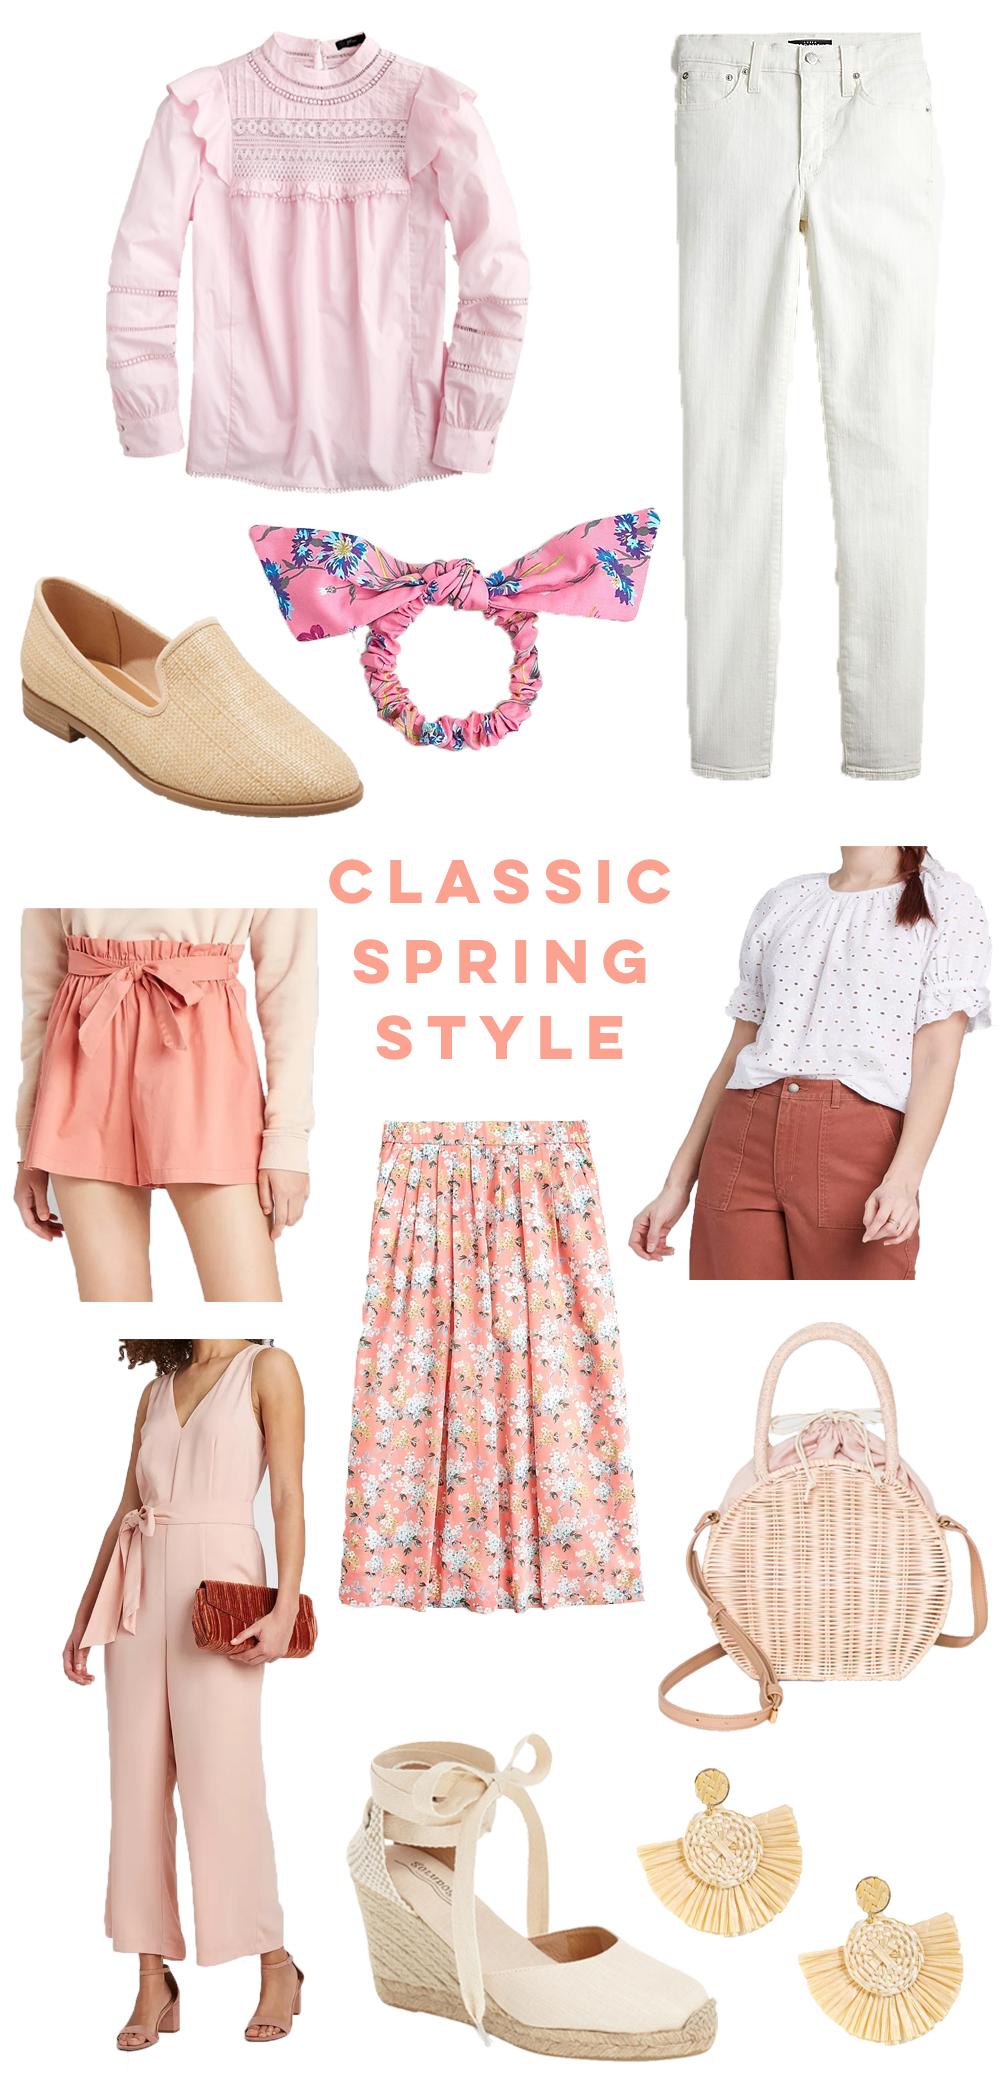 Classic Spring Wardrobe Essentials / Classic Spring Finds / Classic Wardrobe / Classic Essentials / Spring Style Essentials / White Denim / Blouse / Floral Skirts - Sunshine Style, Florida Based Fashion Blog